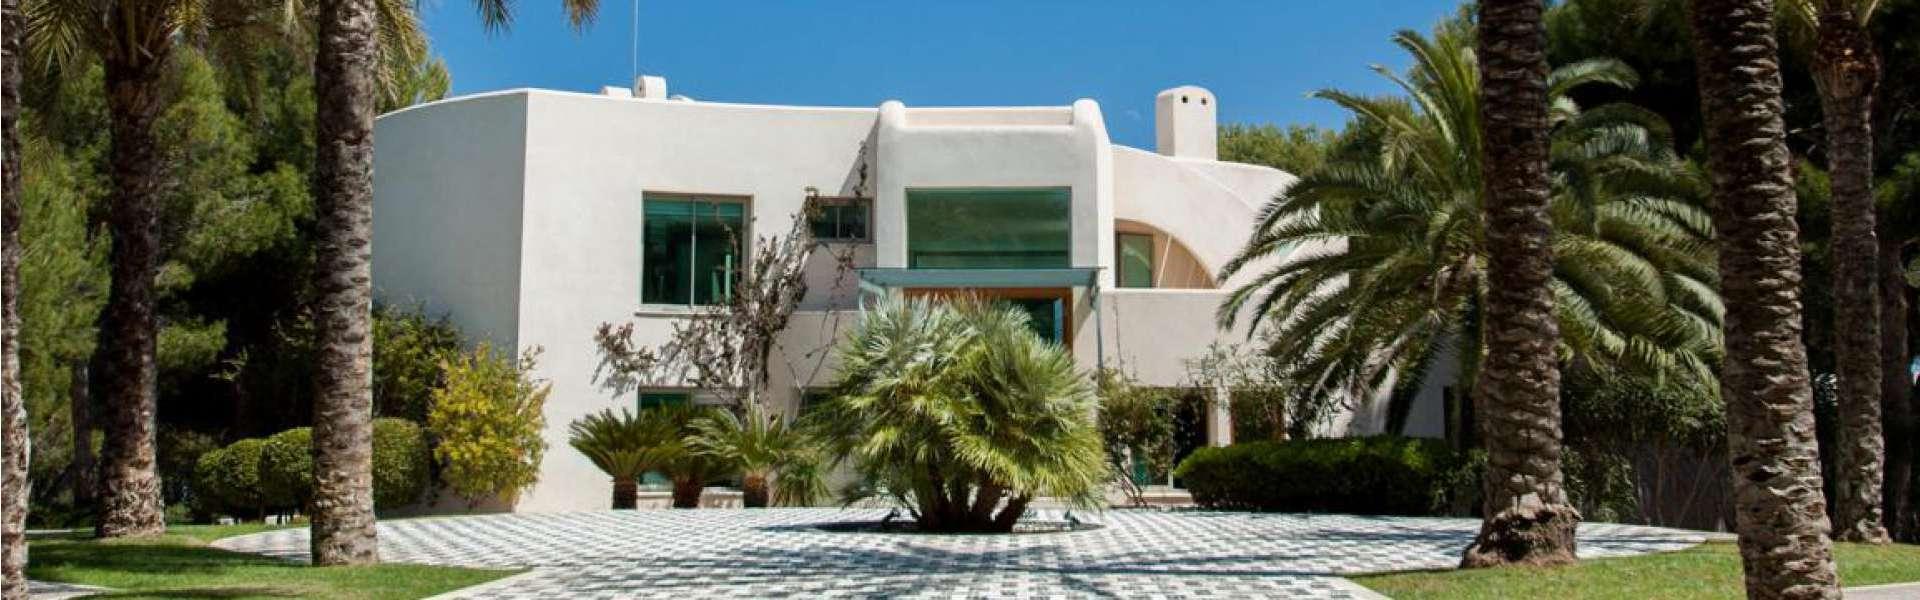 Modern luxury villa in oustanding area - Sol de Mallorca